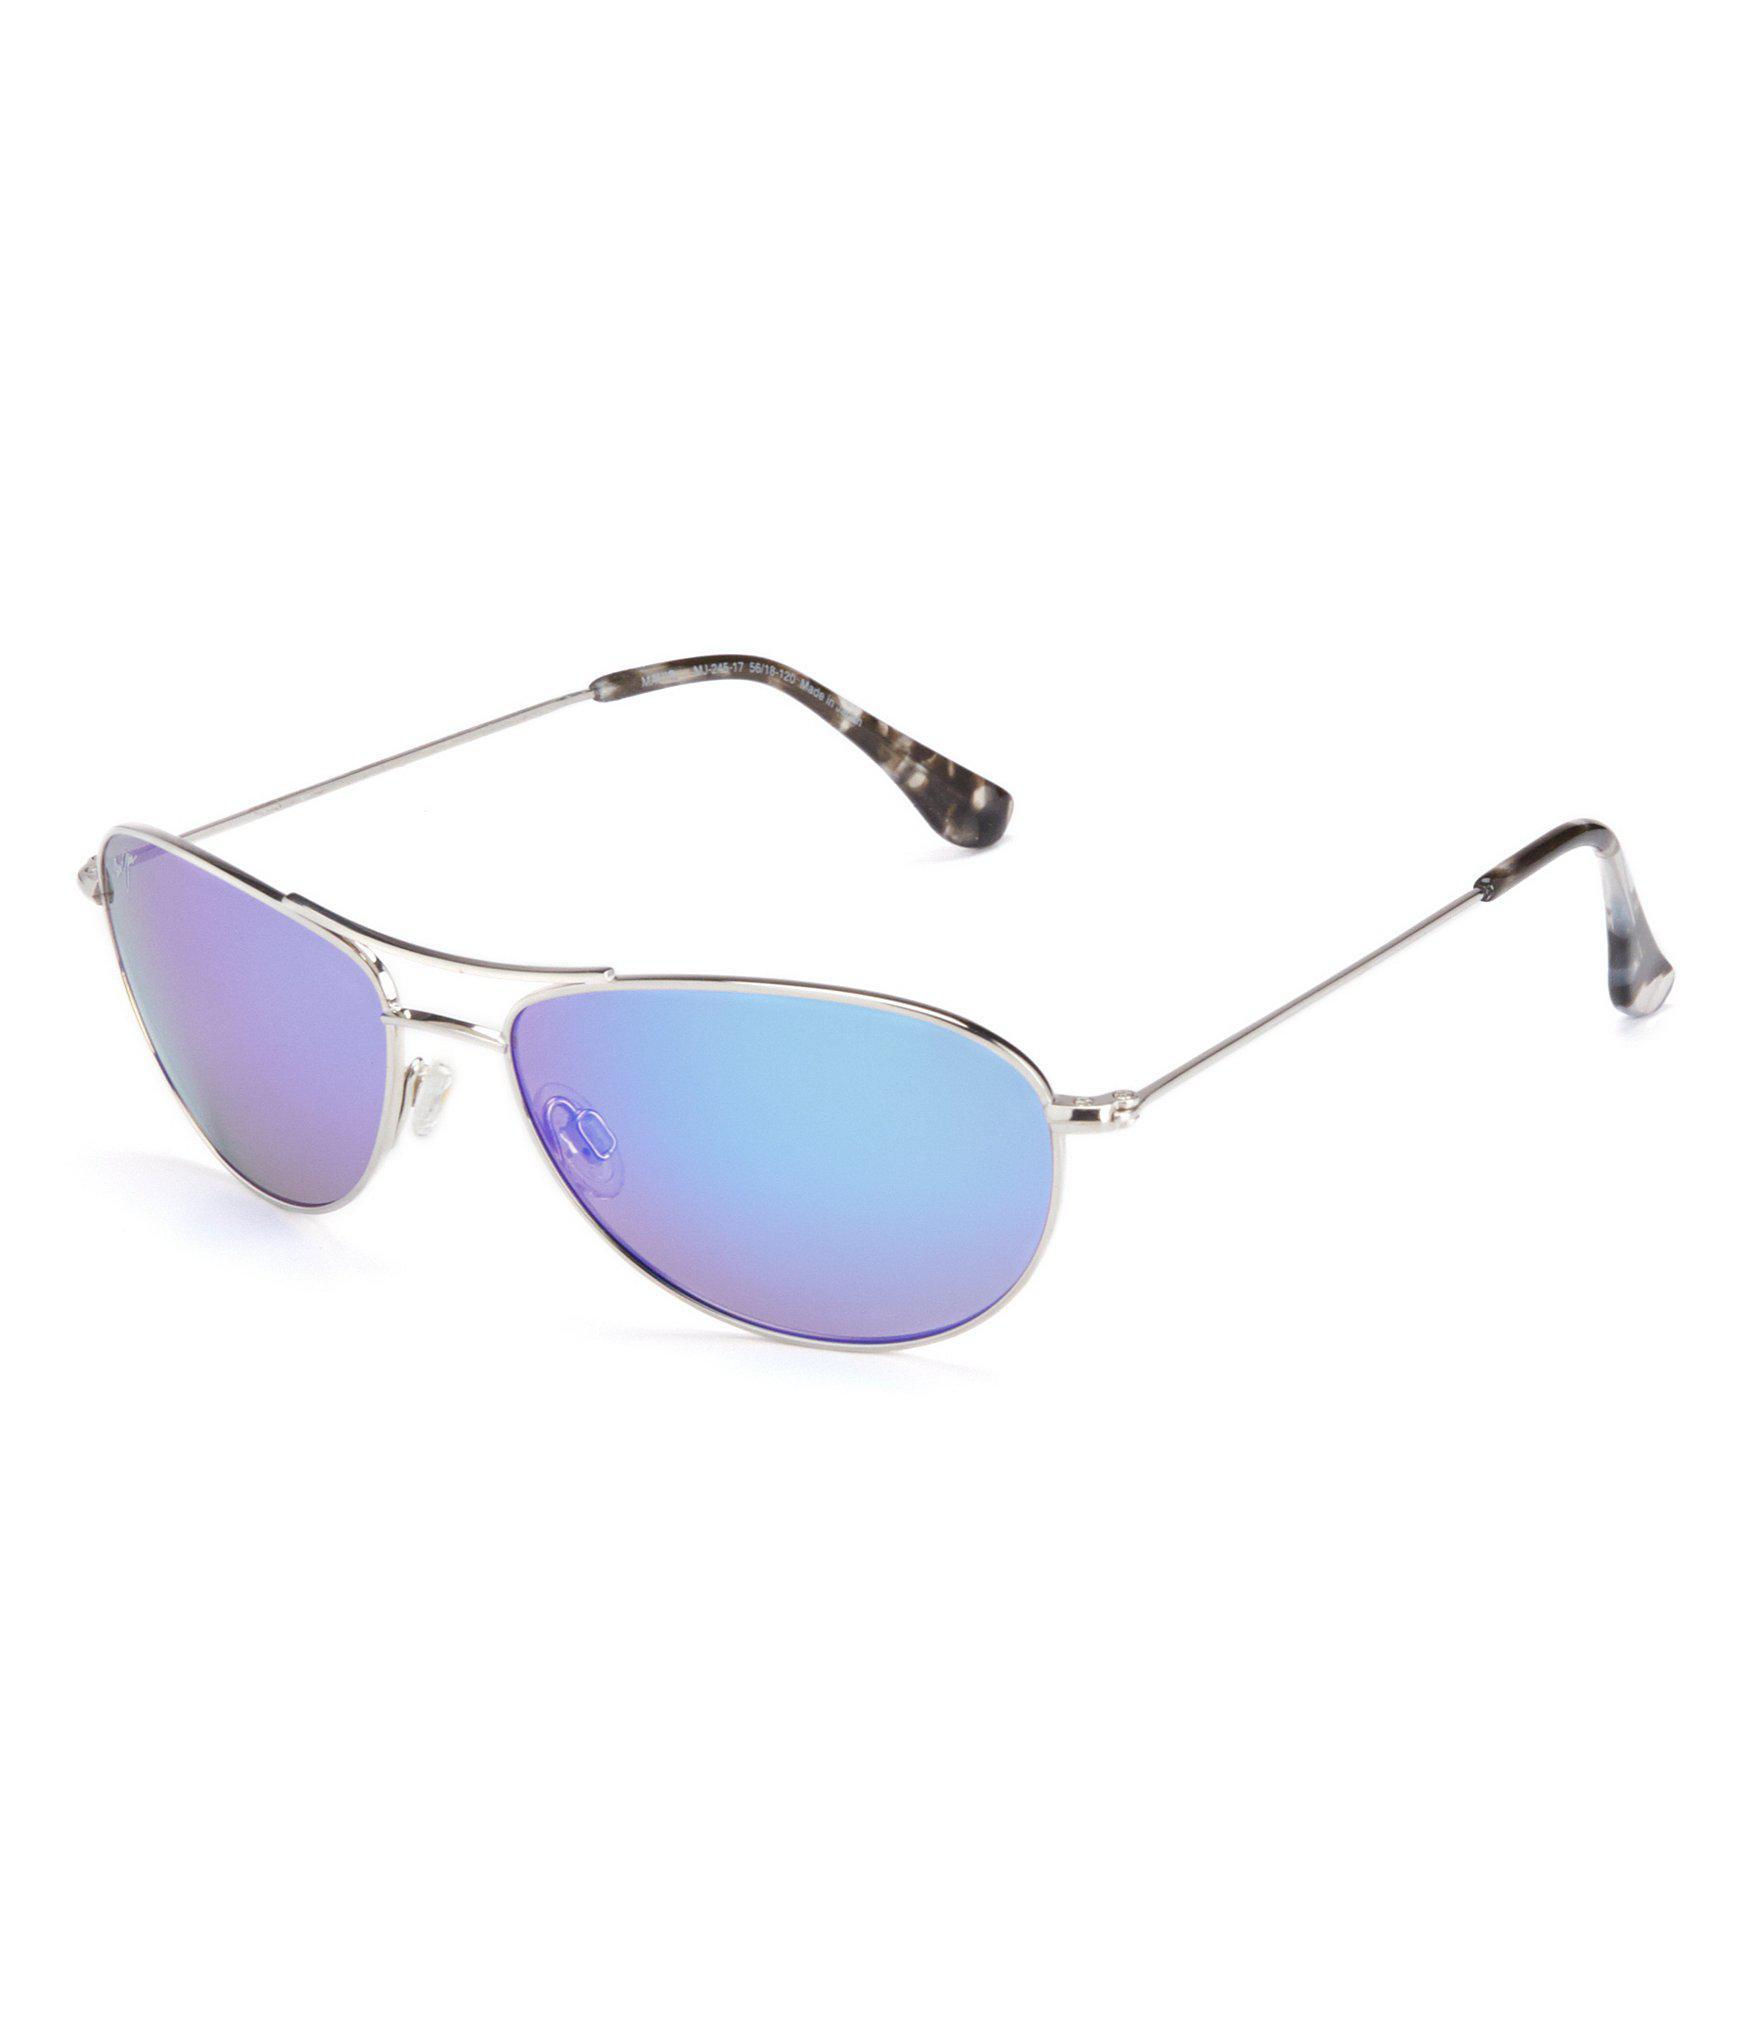 cdd61d56cf Maui Jim Baby Beach Polarized Mirrored Aviator Sunglasses in Blue ...